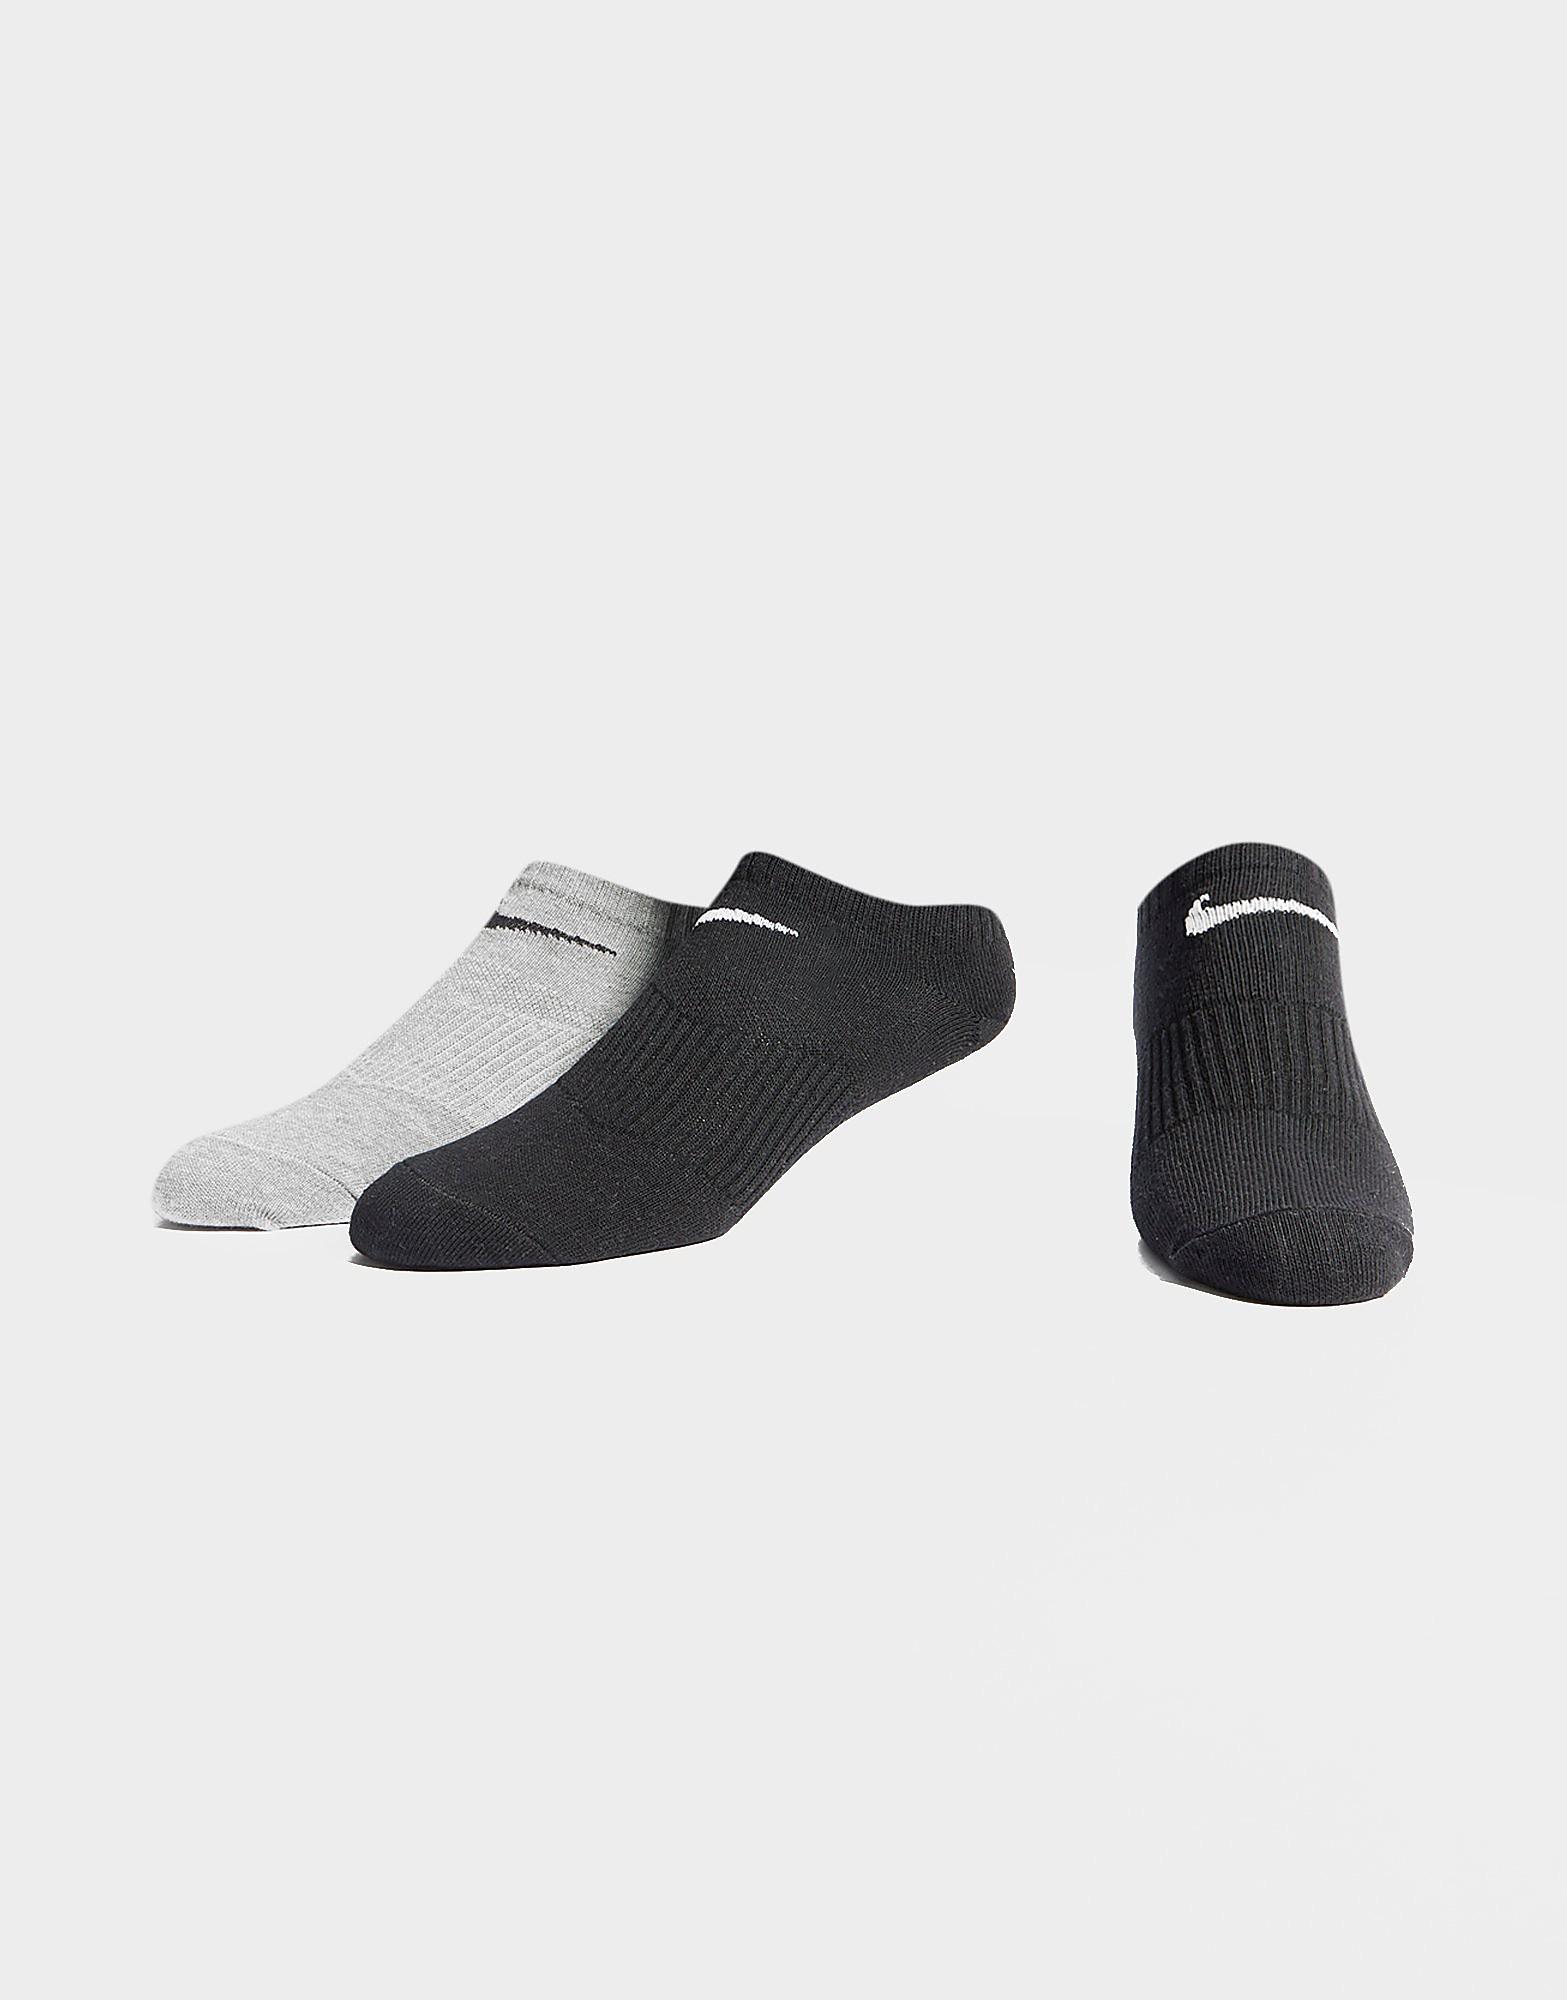 Nike Pak met 3 paar Basic Cuff-sokken - Wit - Heren